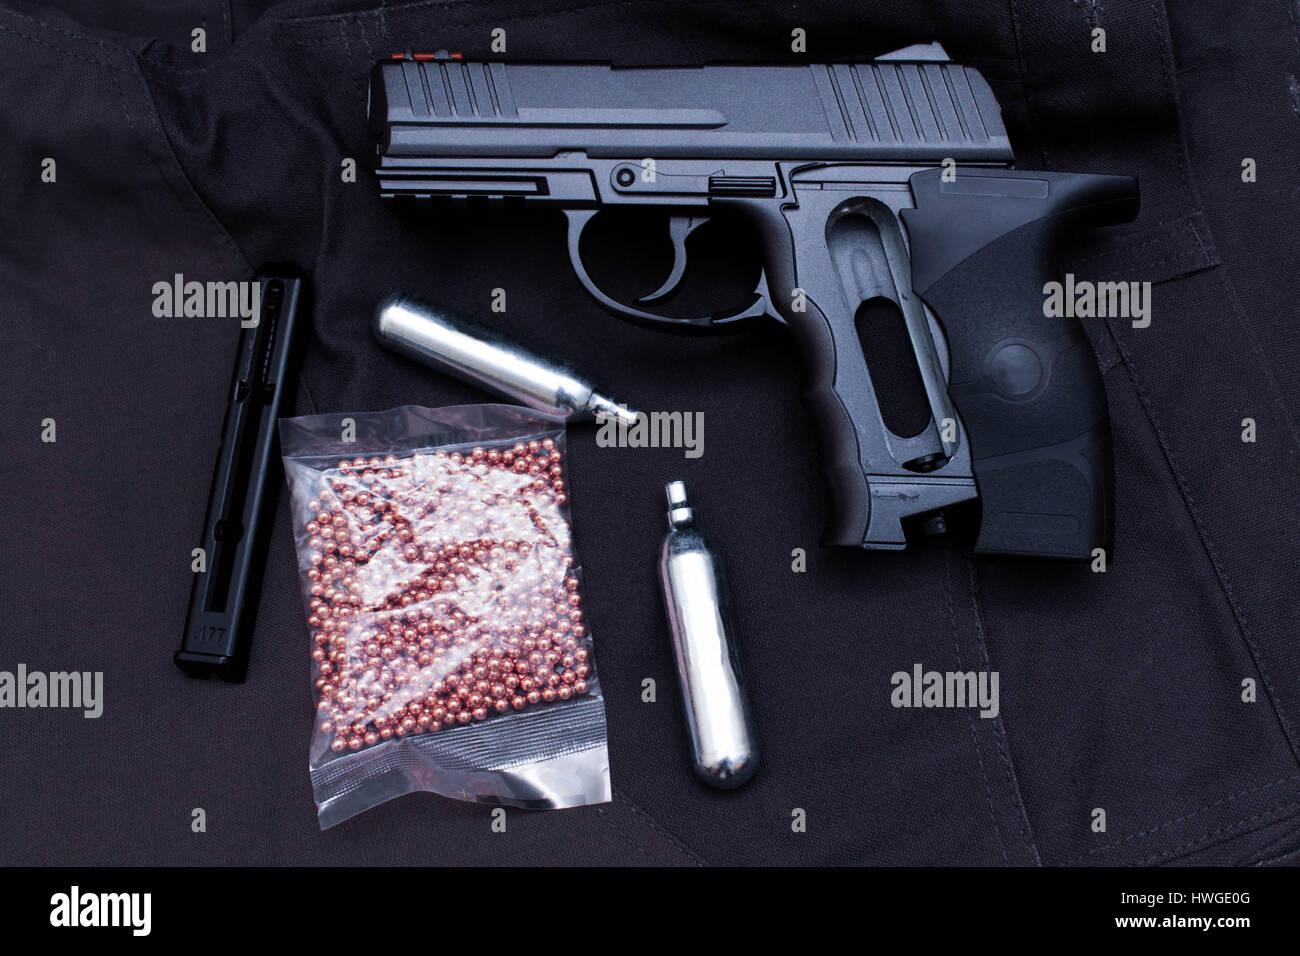 makarov pistol dating muslim matchmaking malaysia